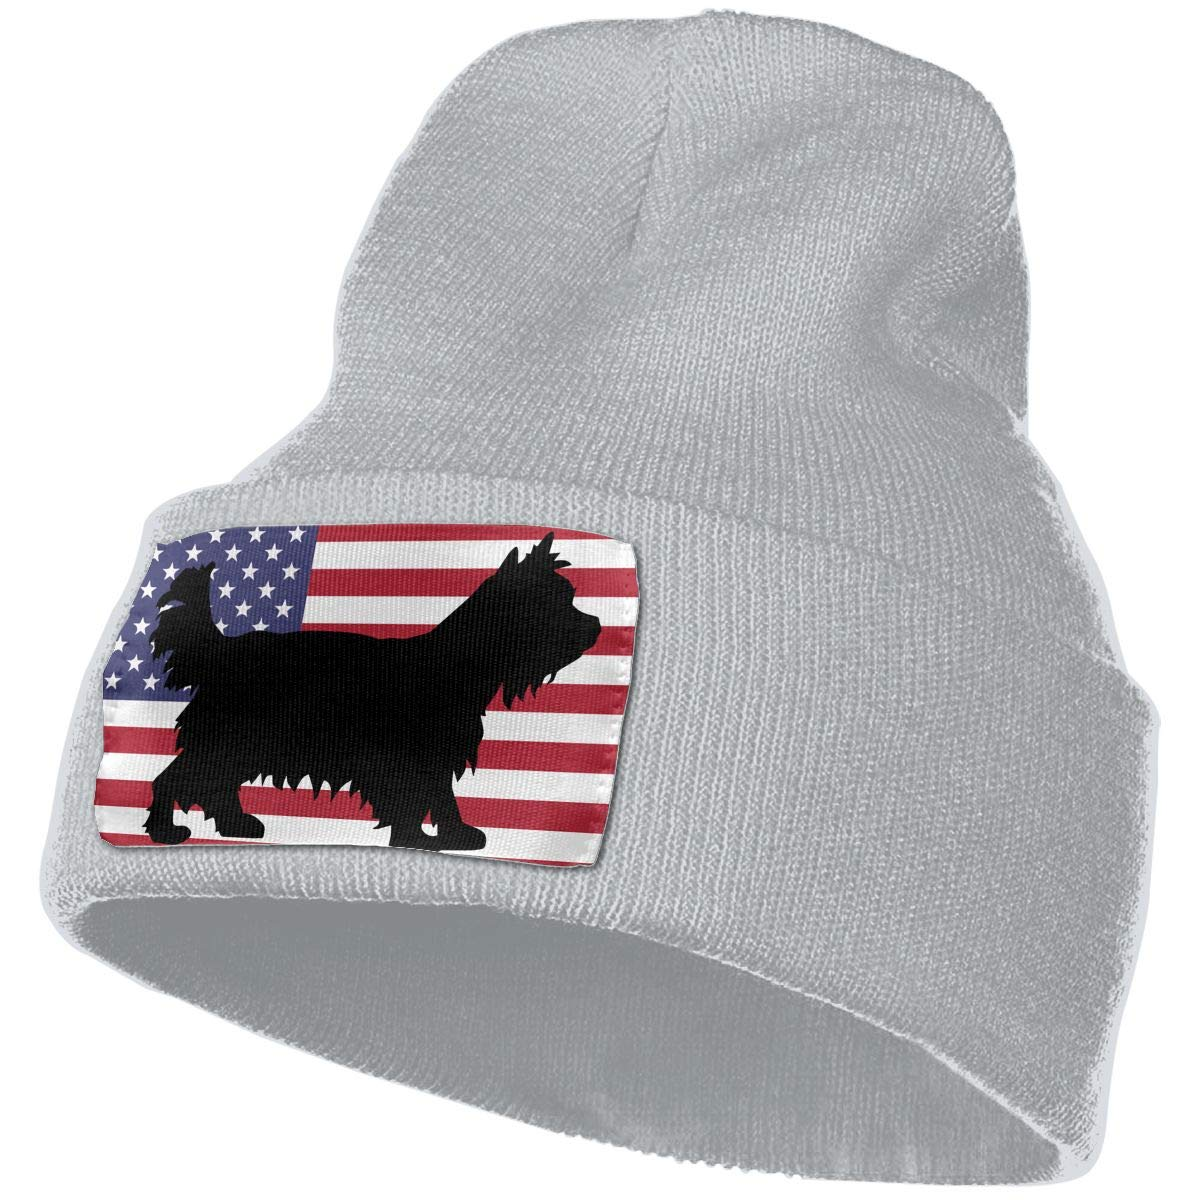 MXMAOM9MX Yorkshire Terrier USA Flag Warm Knitting Hat Mens Womens 100/% Acrylic Skull Cap